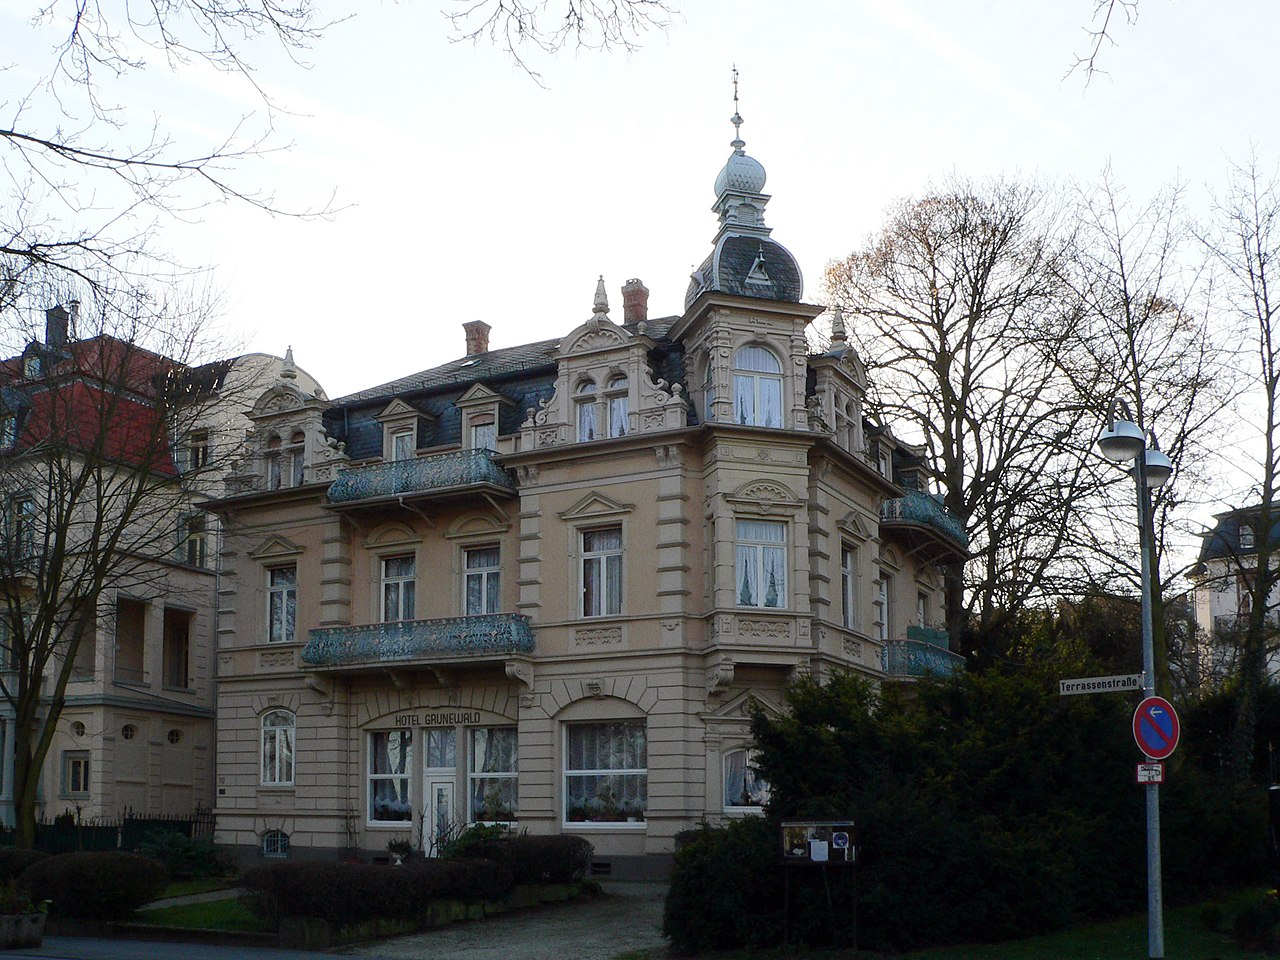 Hotel Villa Grunewald Terrassenstra Ef Bf Bde   Bad Nauheim